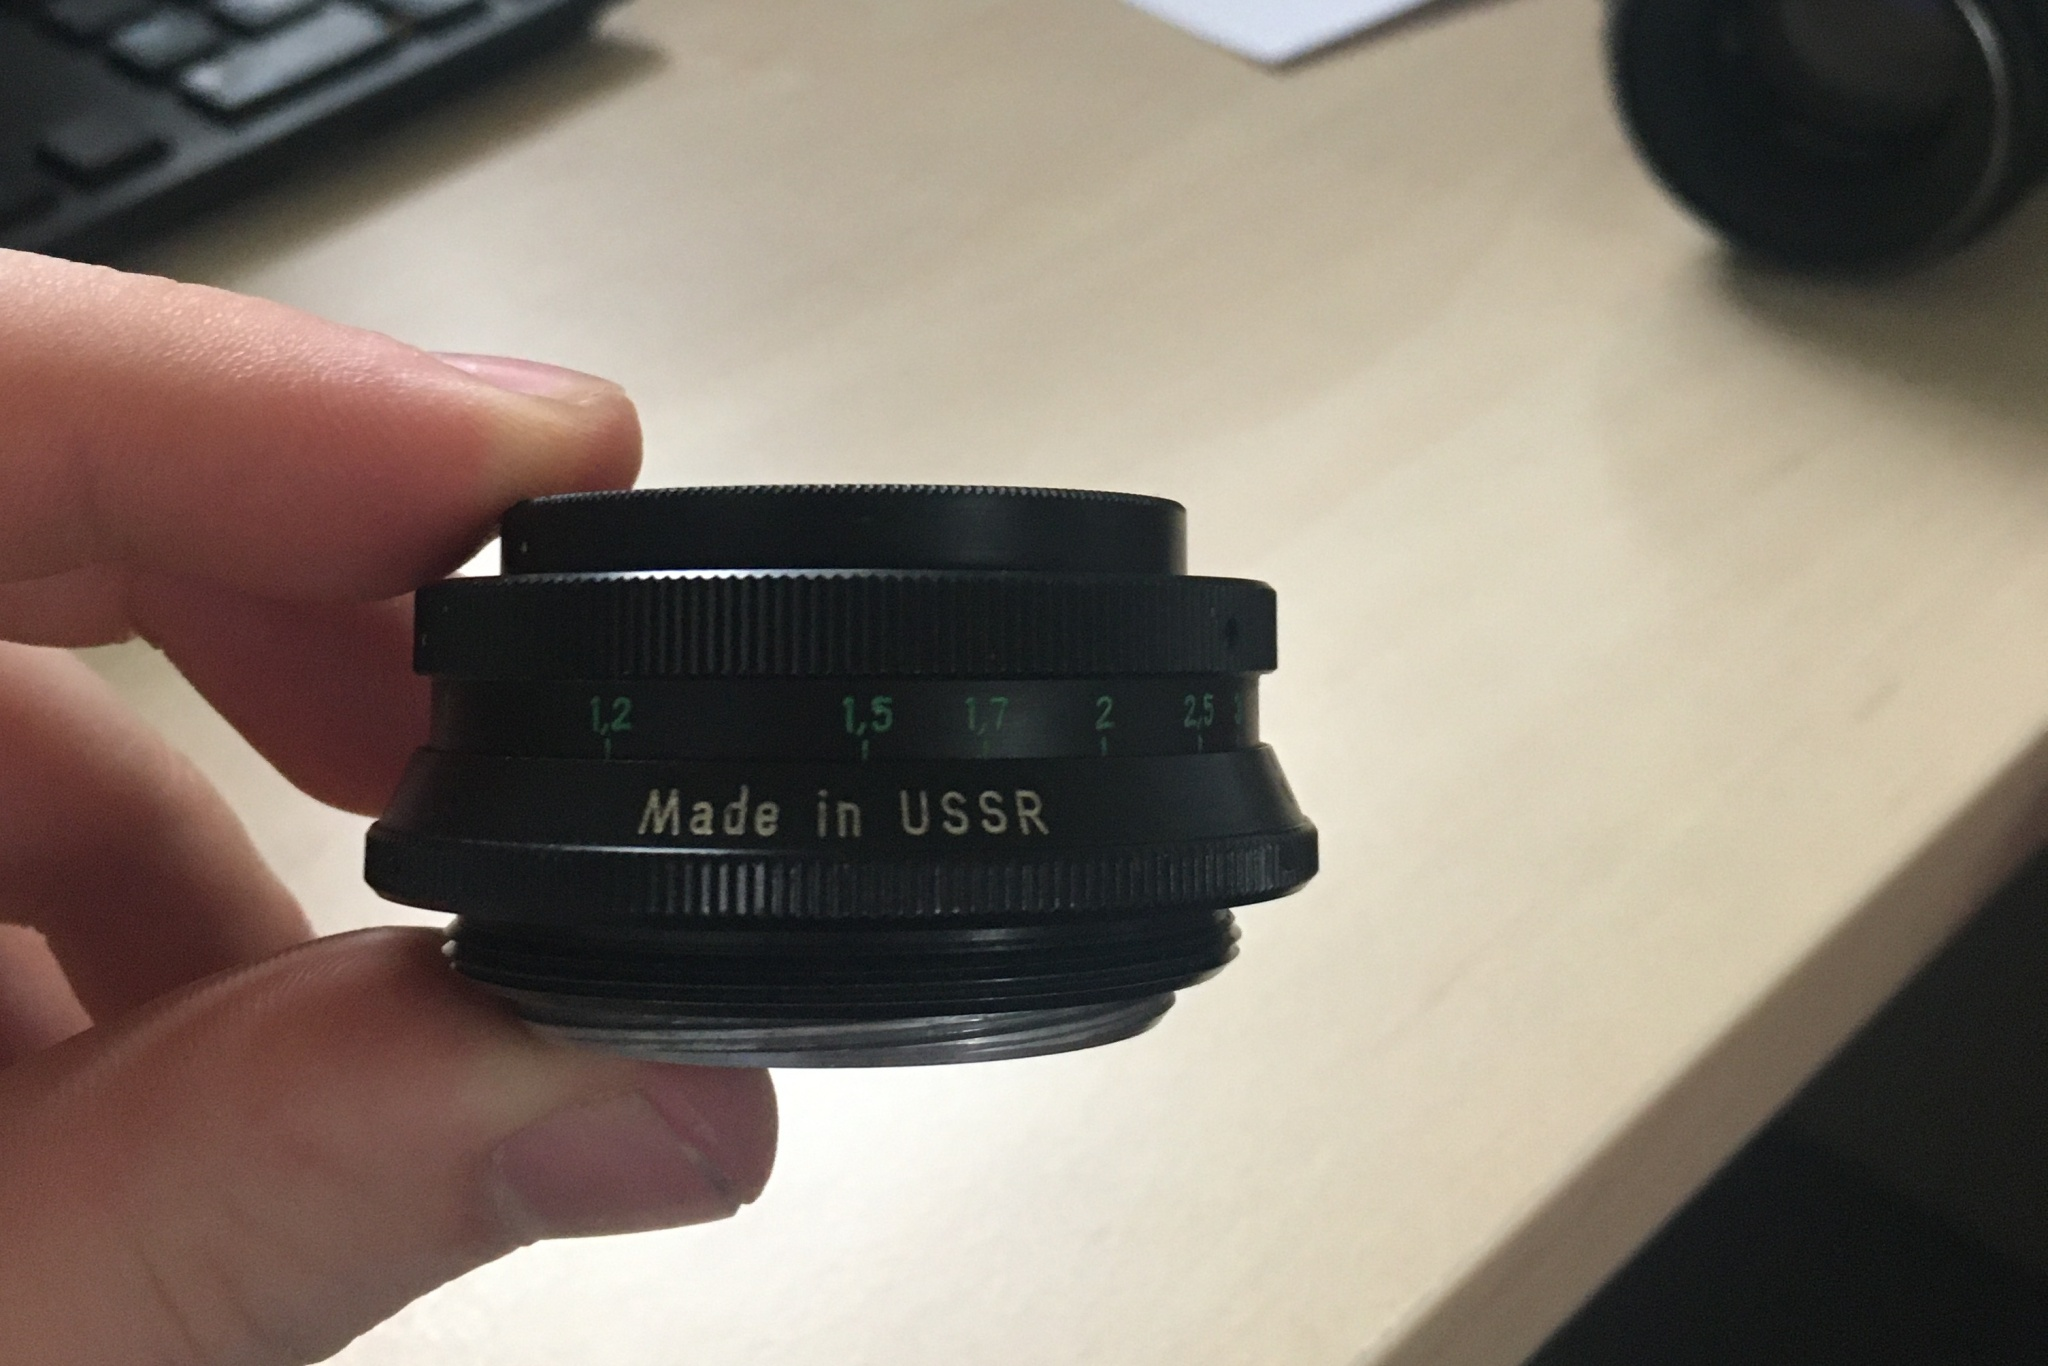 Vintage lenses on a digital body? Beautiful bokeh, lens flare, and unique details